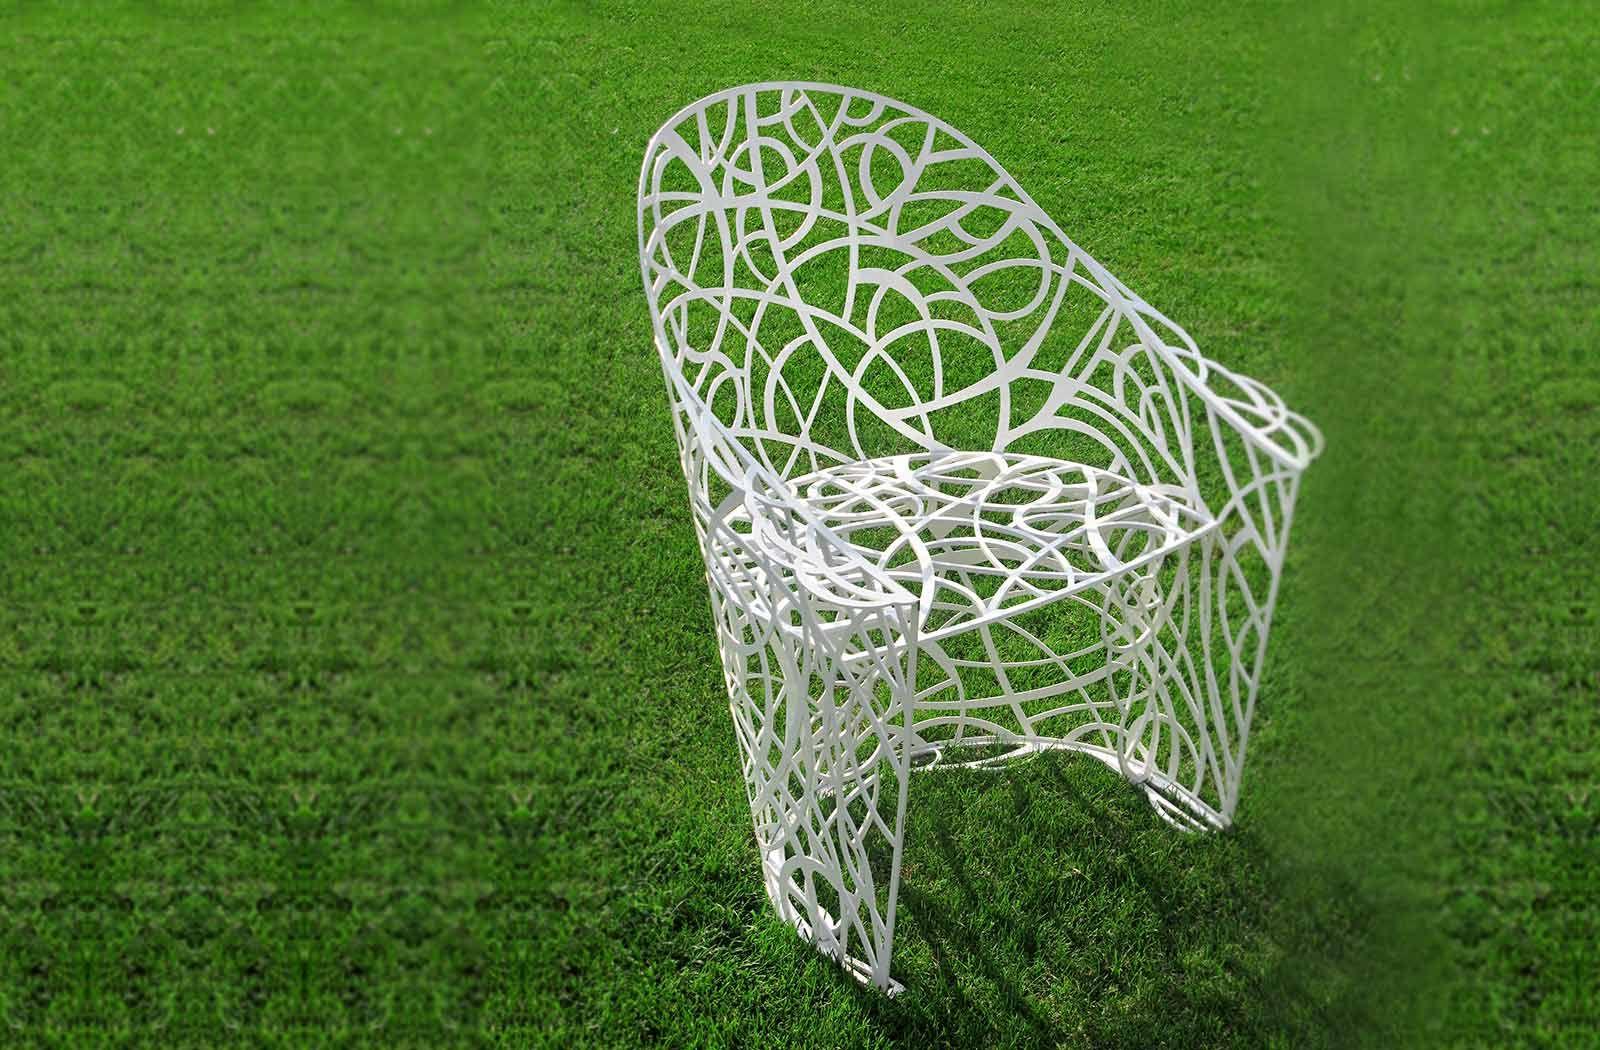 Красивый стул на газоне